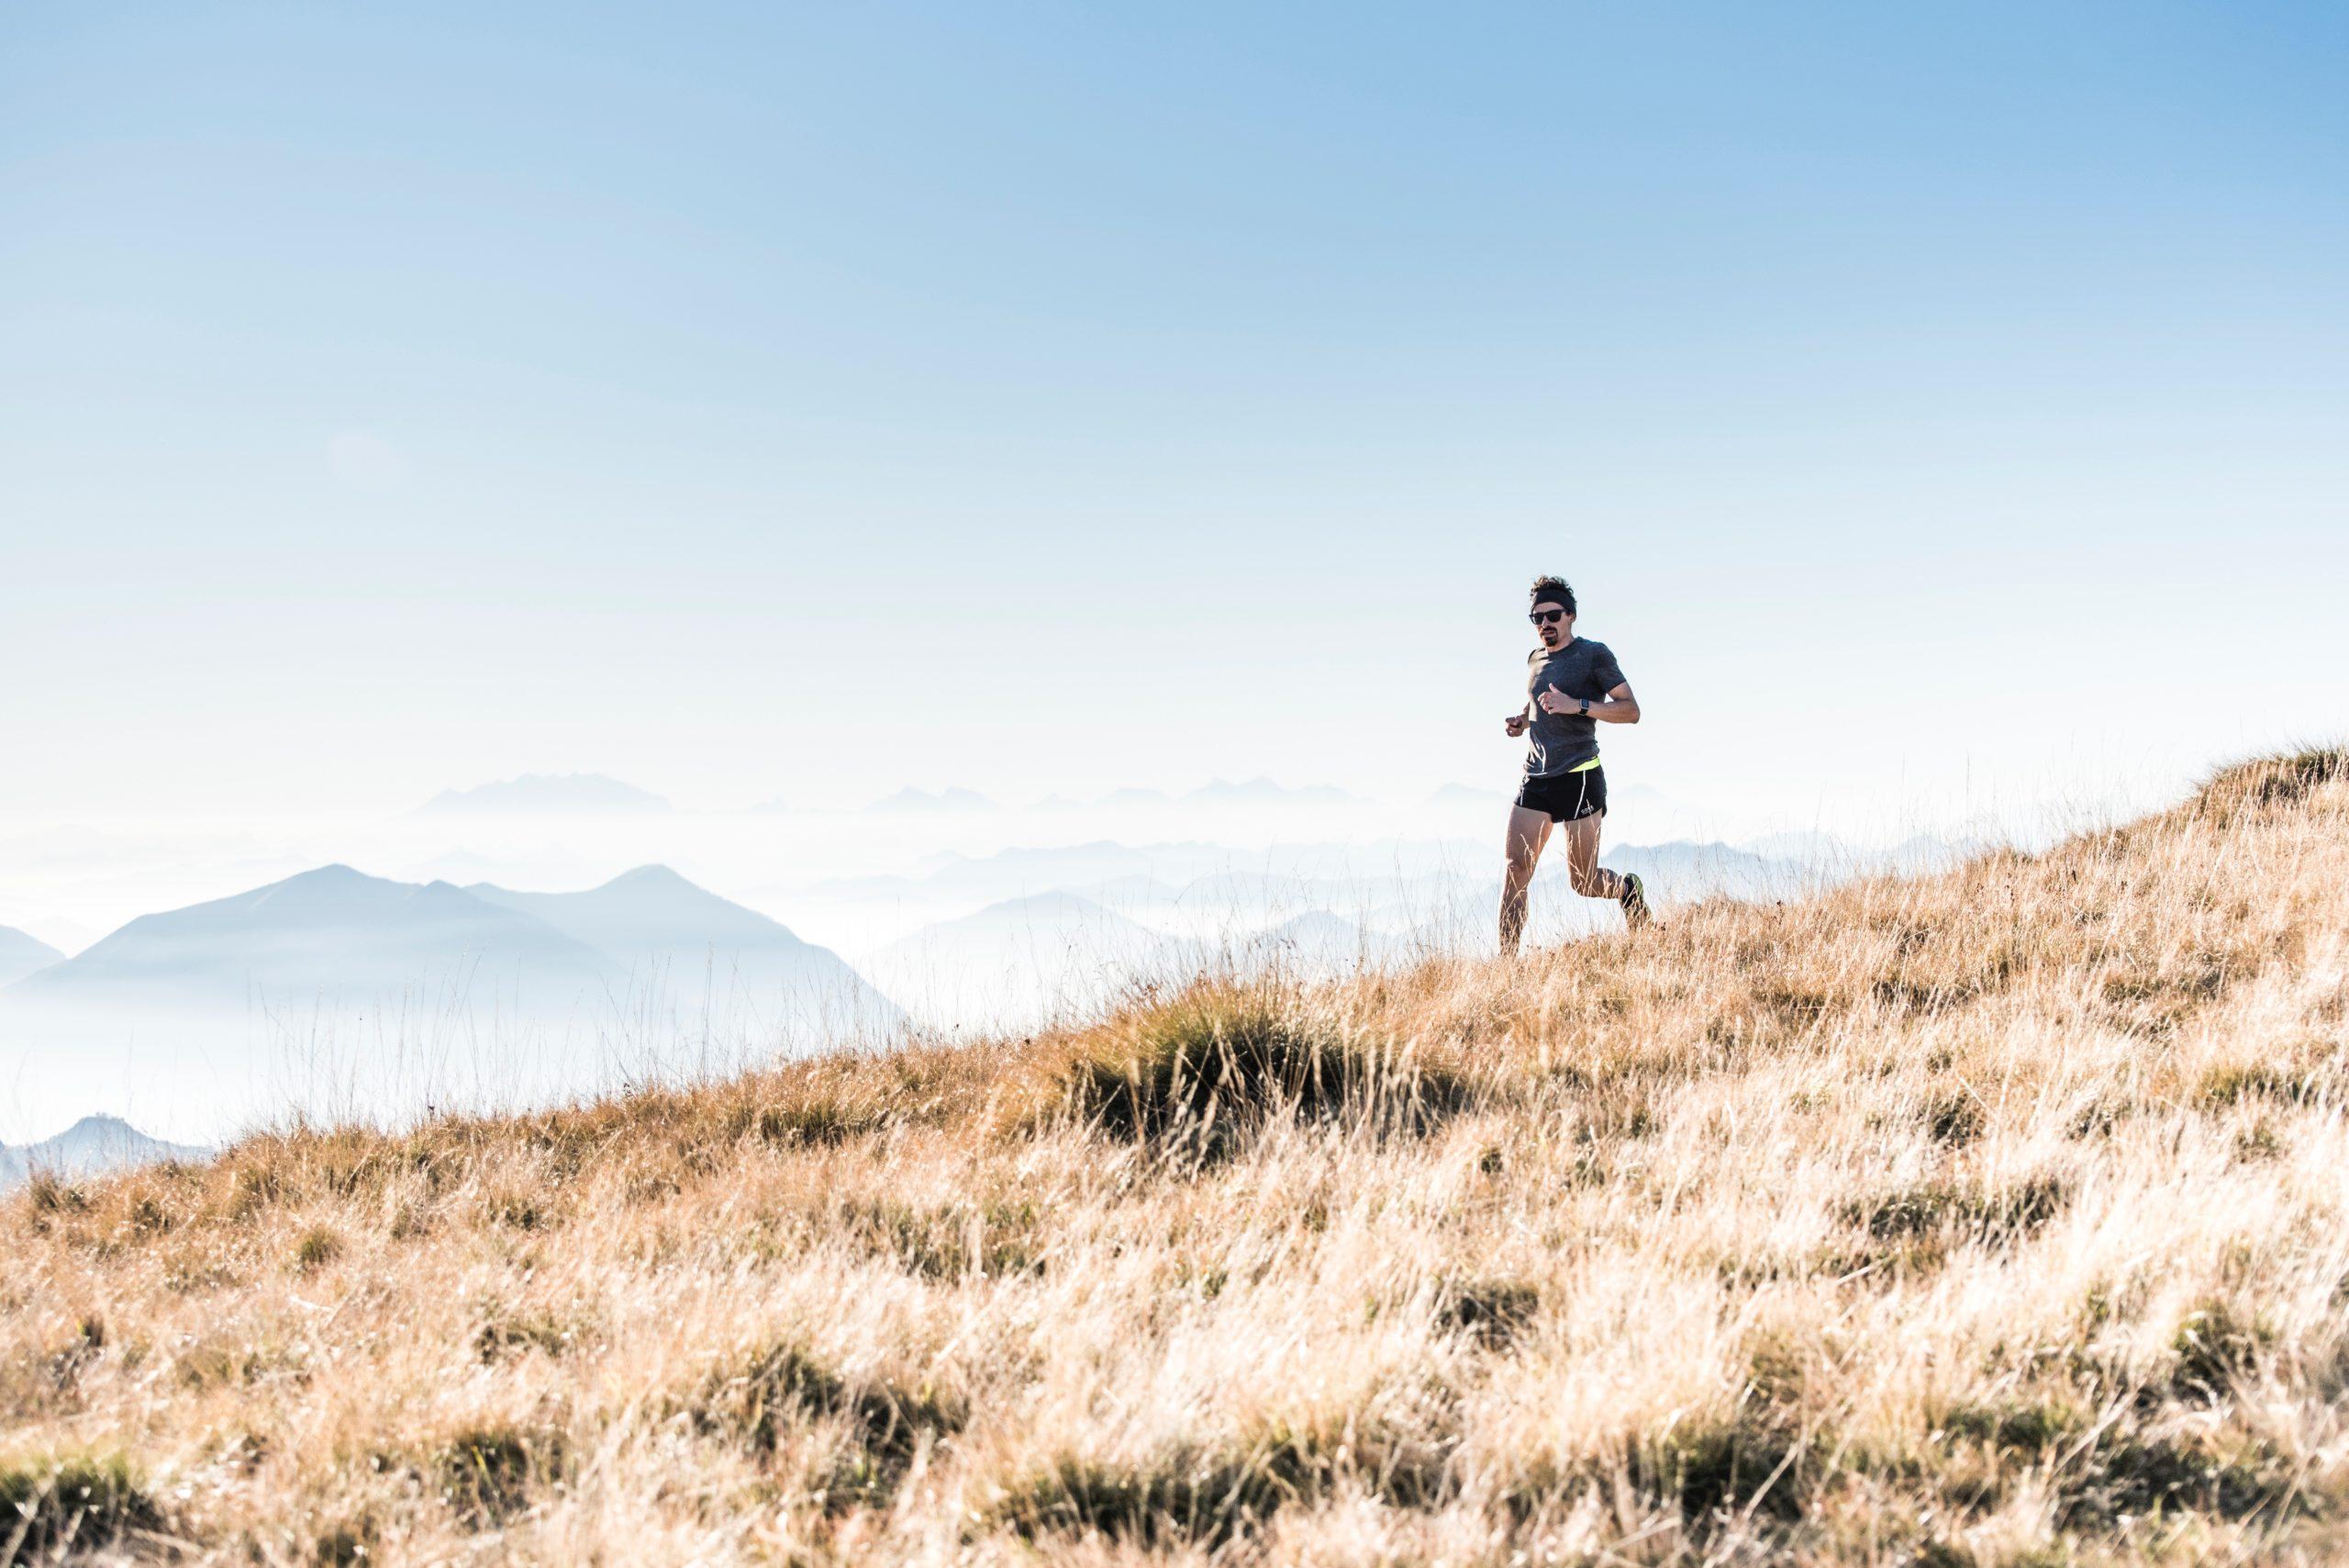 Why do I run? Why do I race? What prize do I seek?